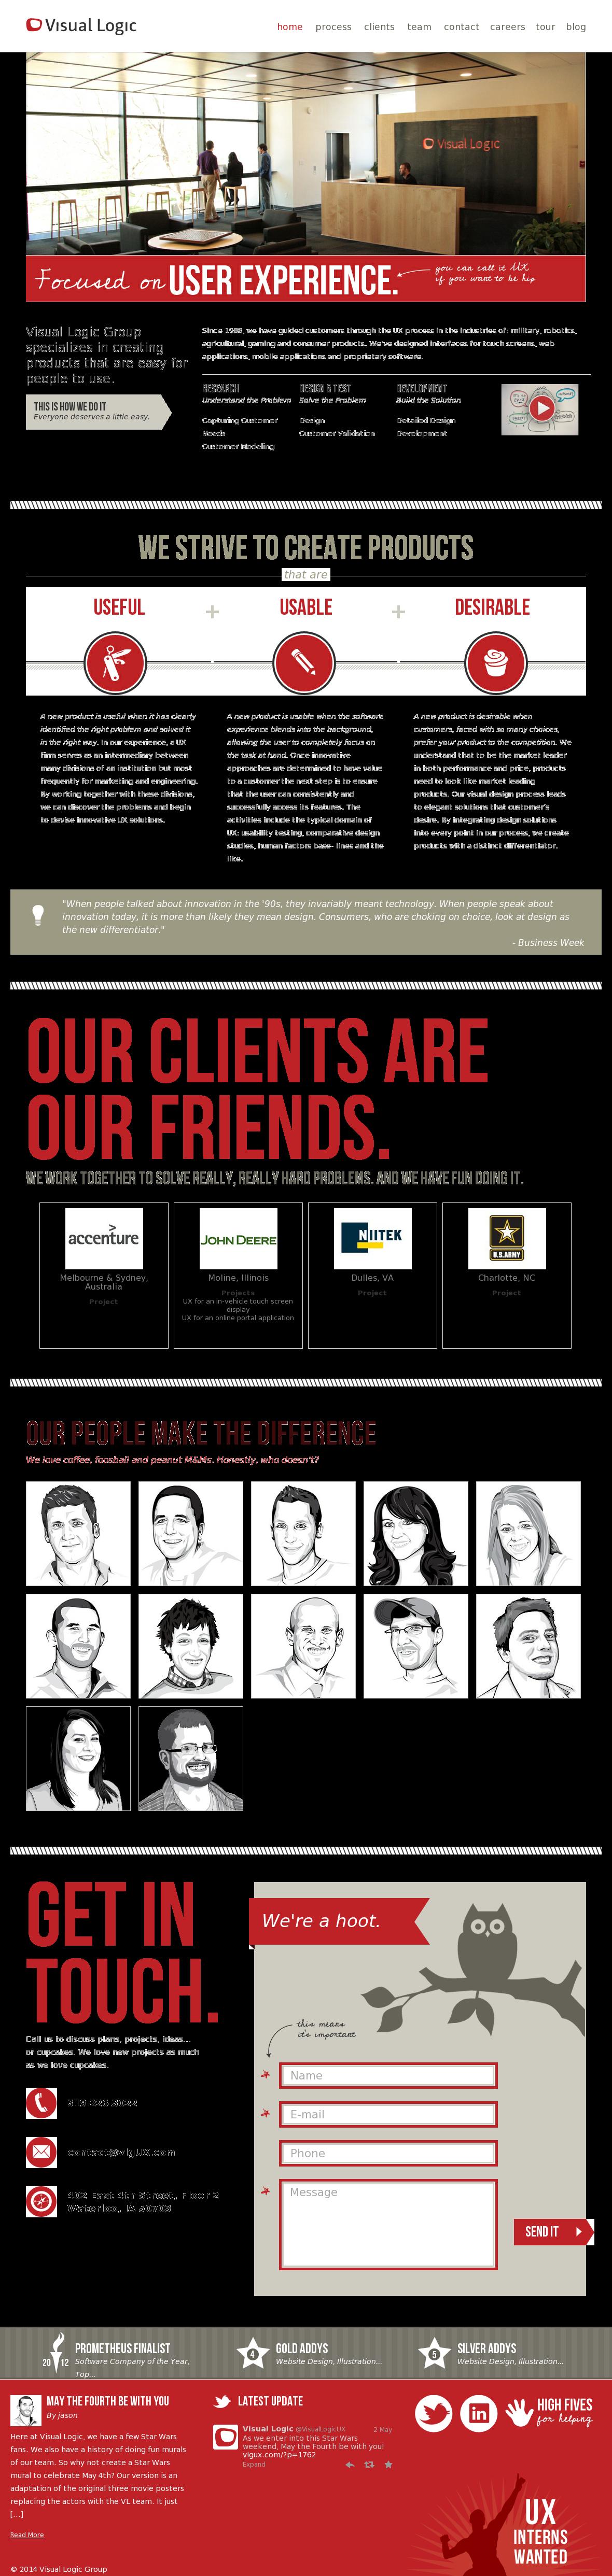 Visual Logic Competitors, Revenue and Employees - Owler Company Profile